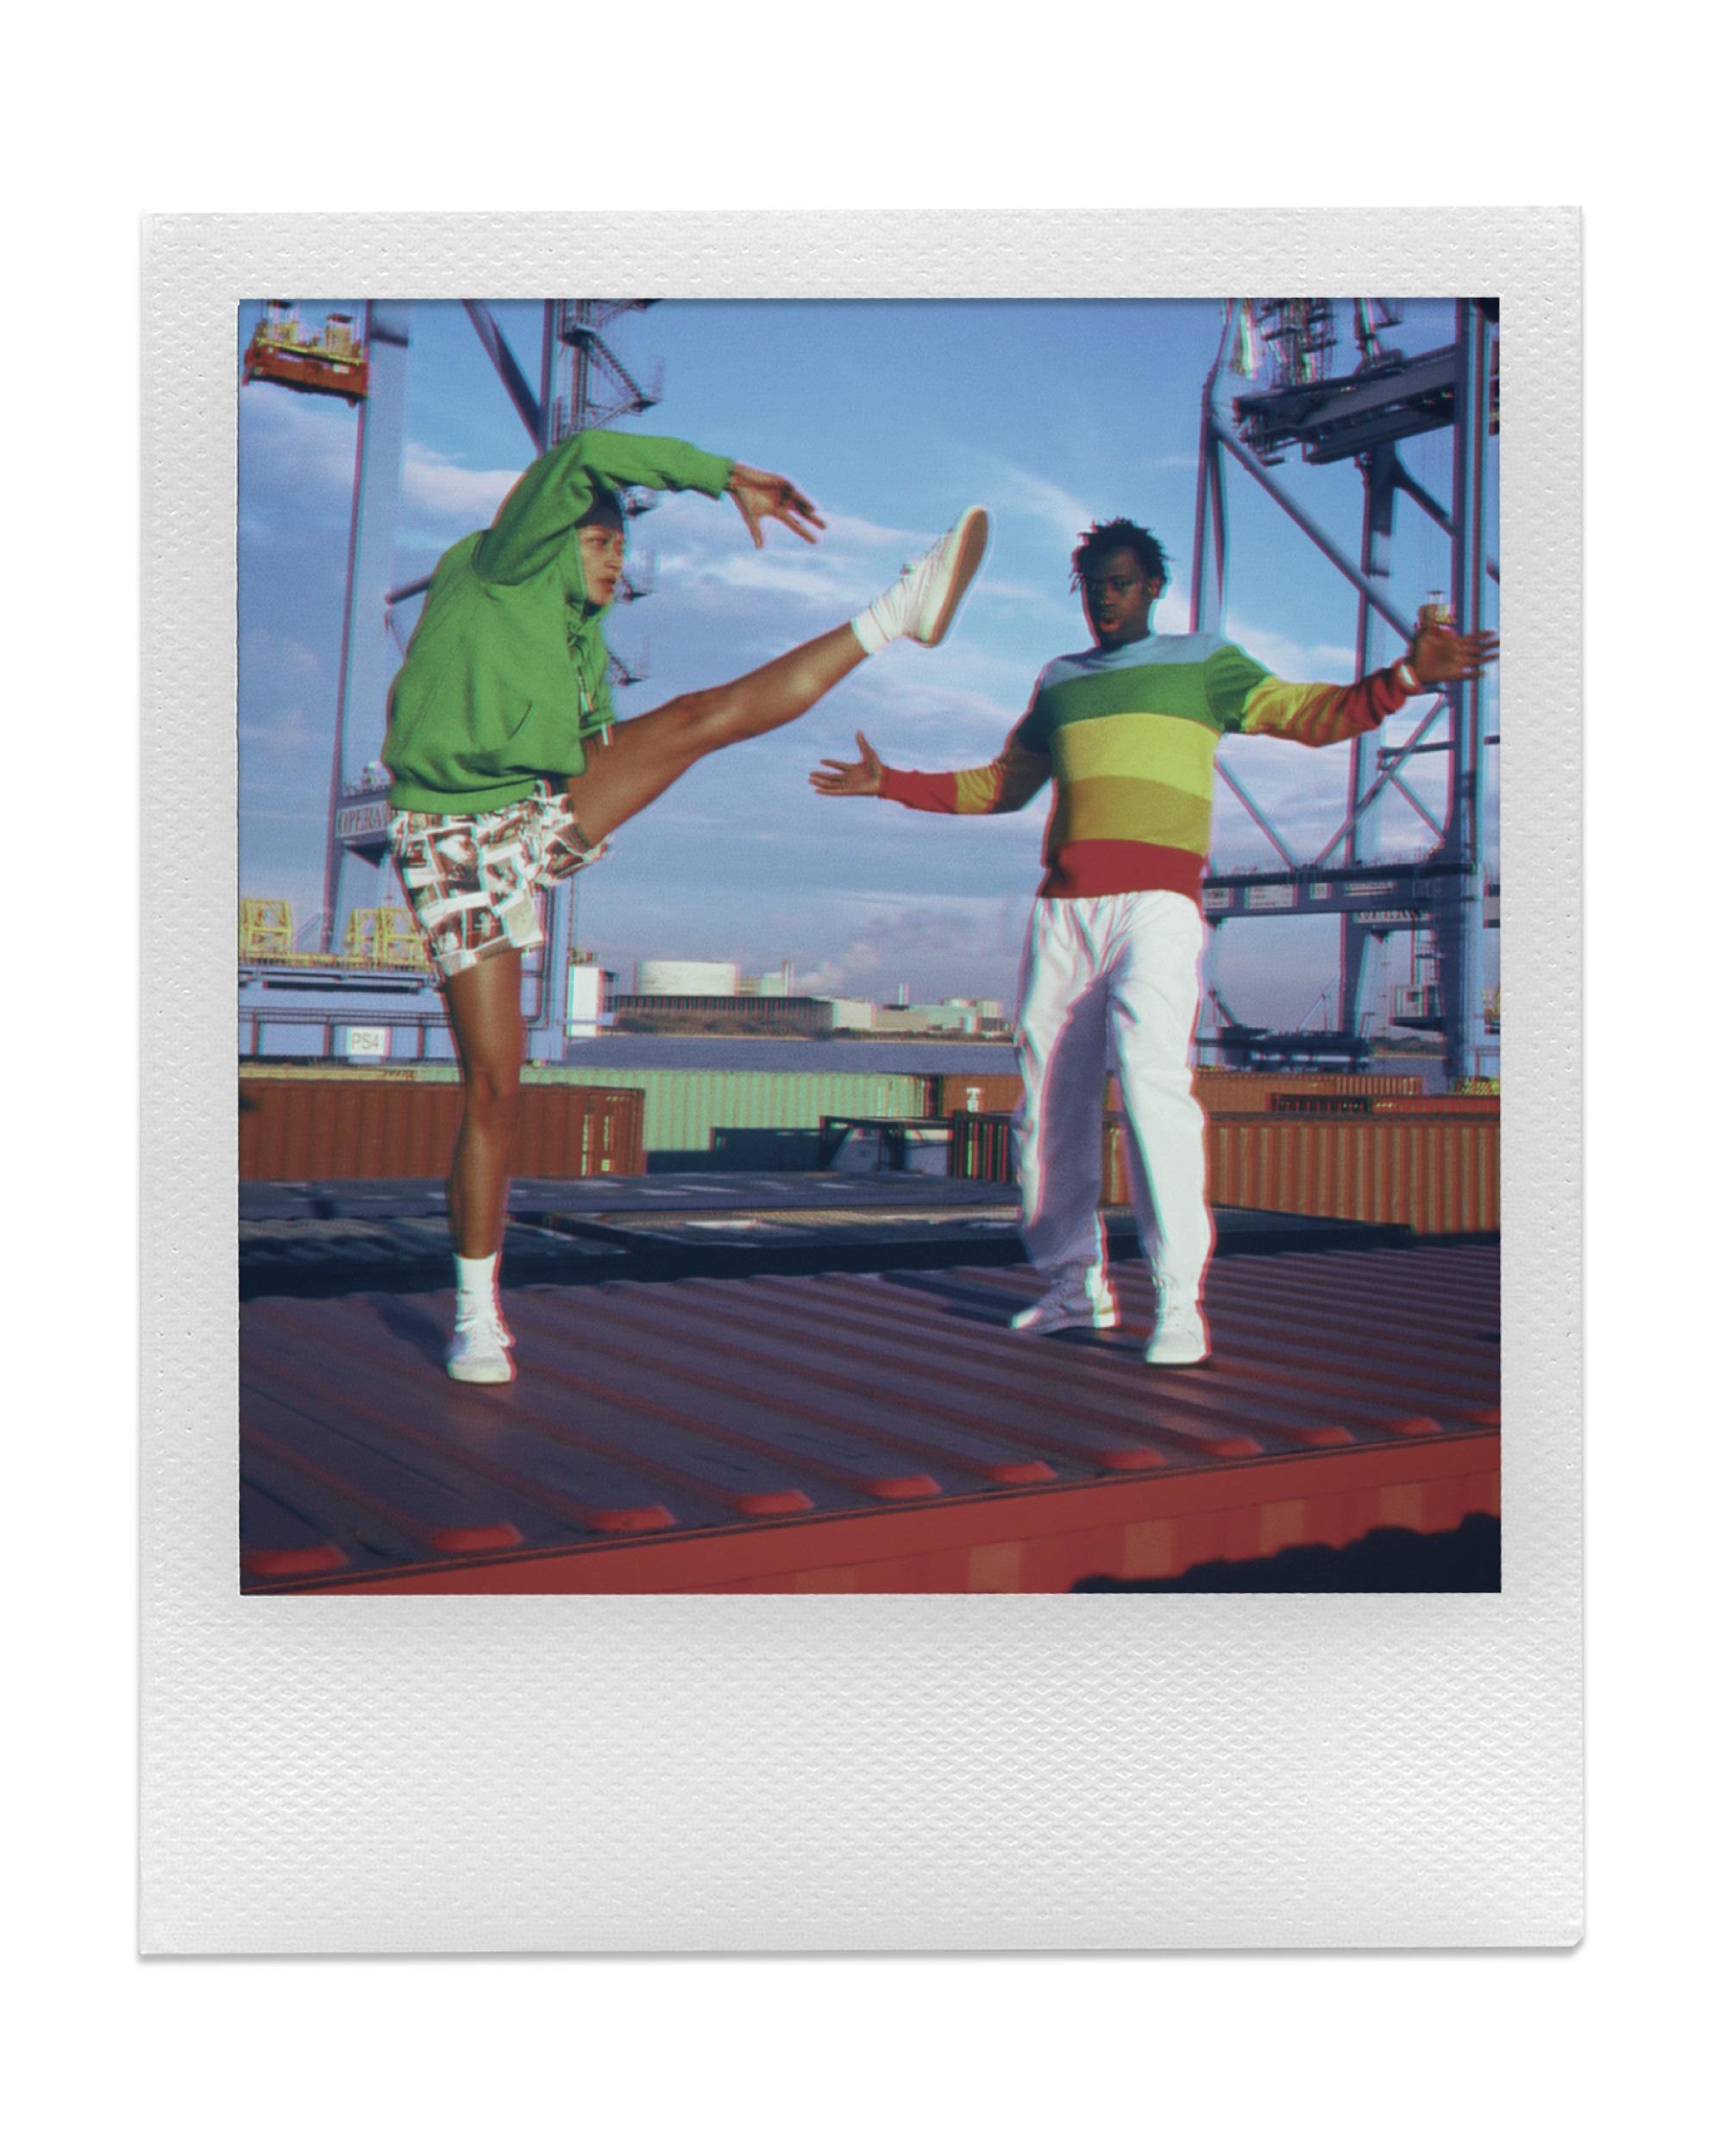 bst lacoste x polaroid nhiều màu sắc